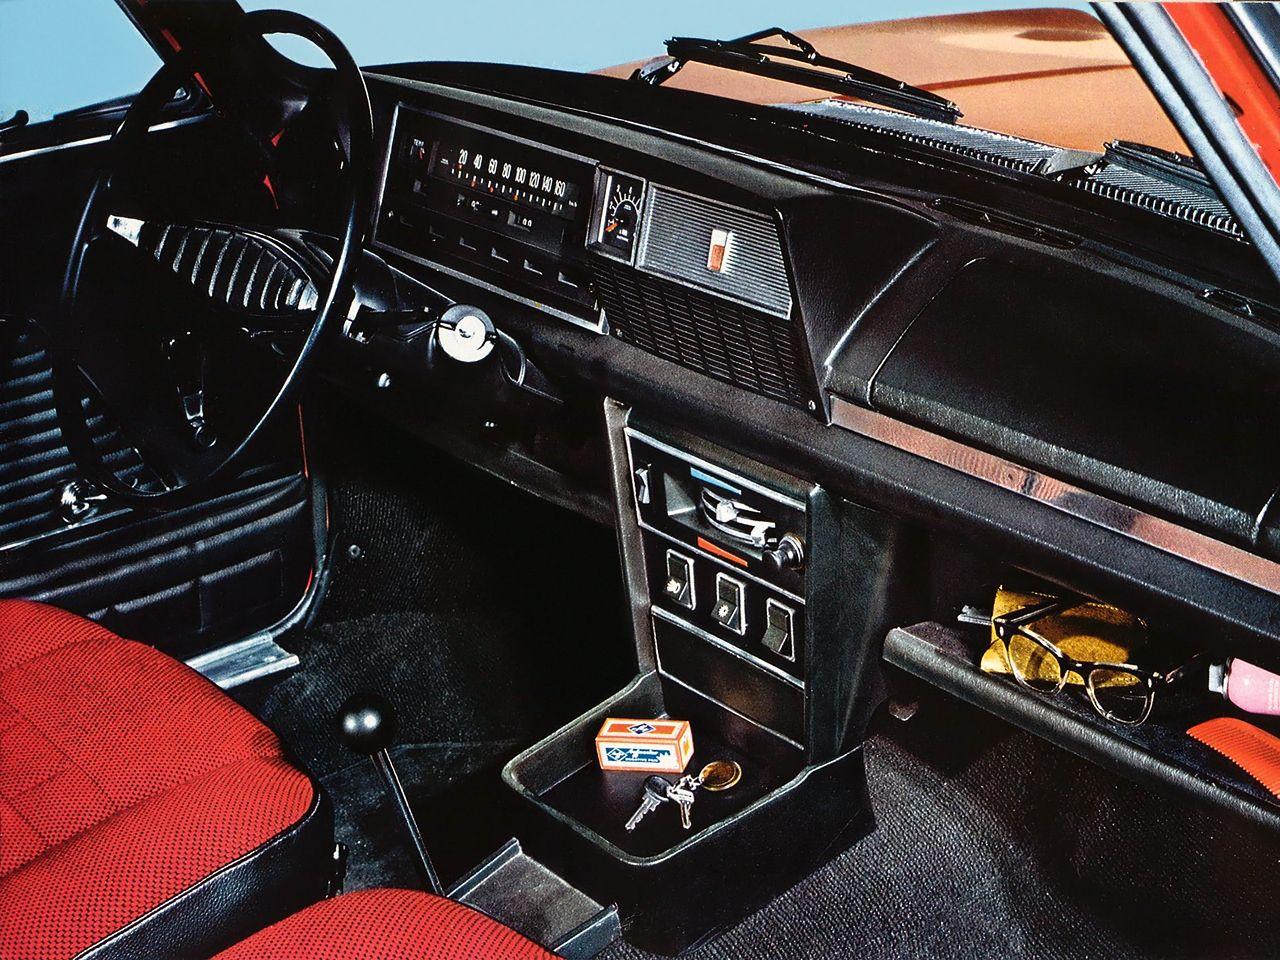 1972 Polski Fiat 125p Kombi Automoviles